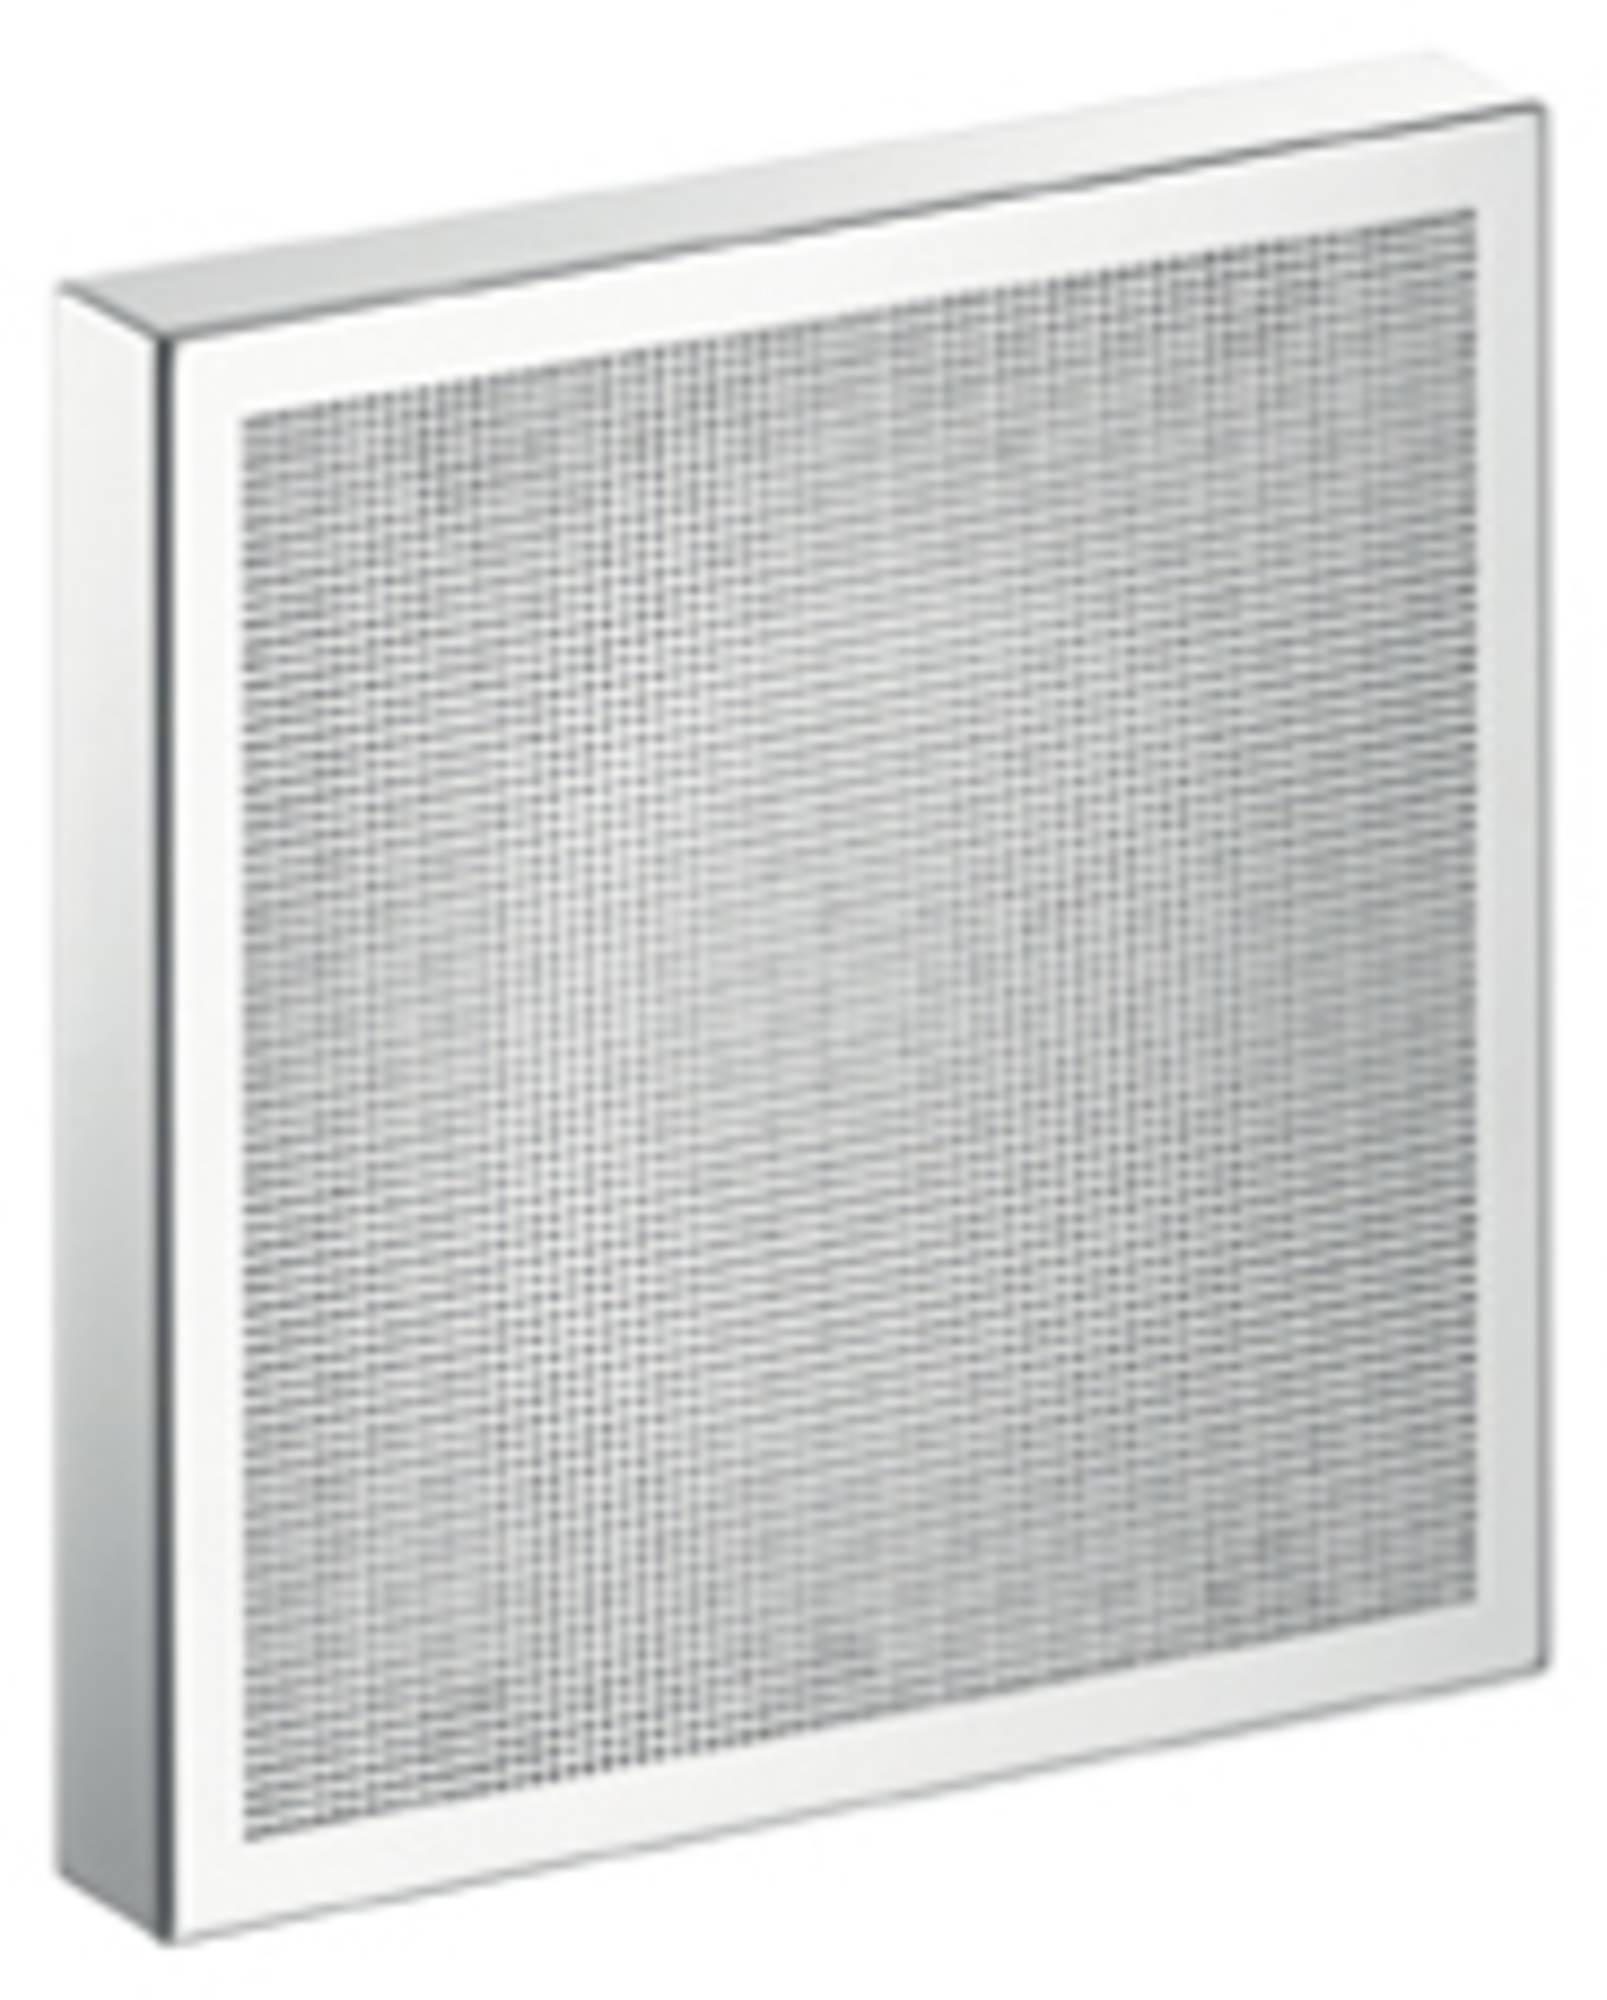 Hansgrohe Axor Starck shower collection afdekset speaker module Chroom